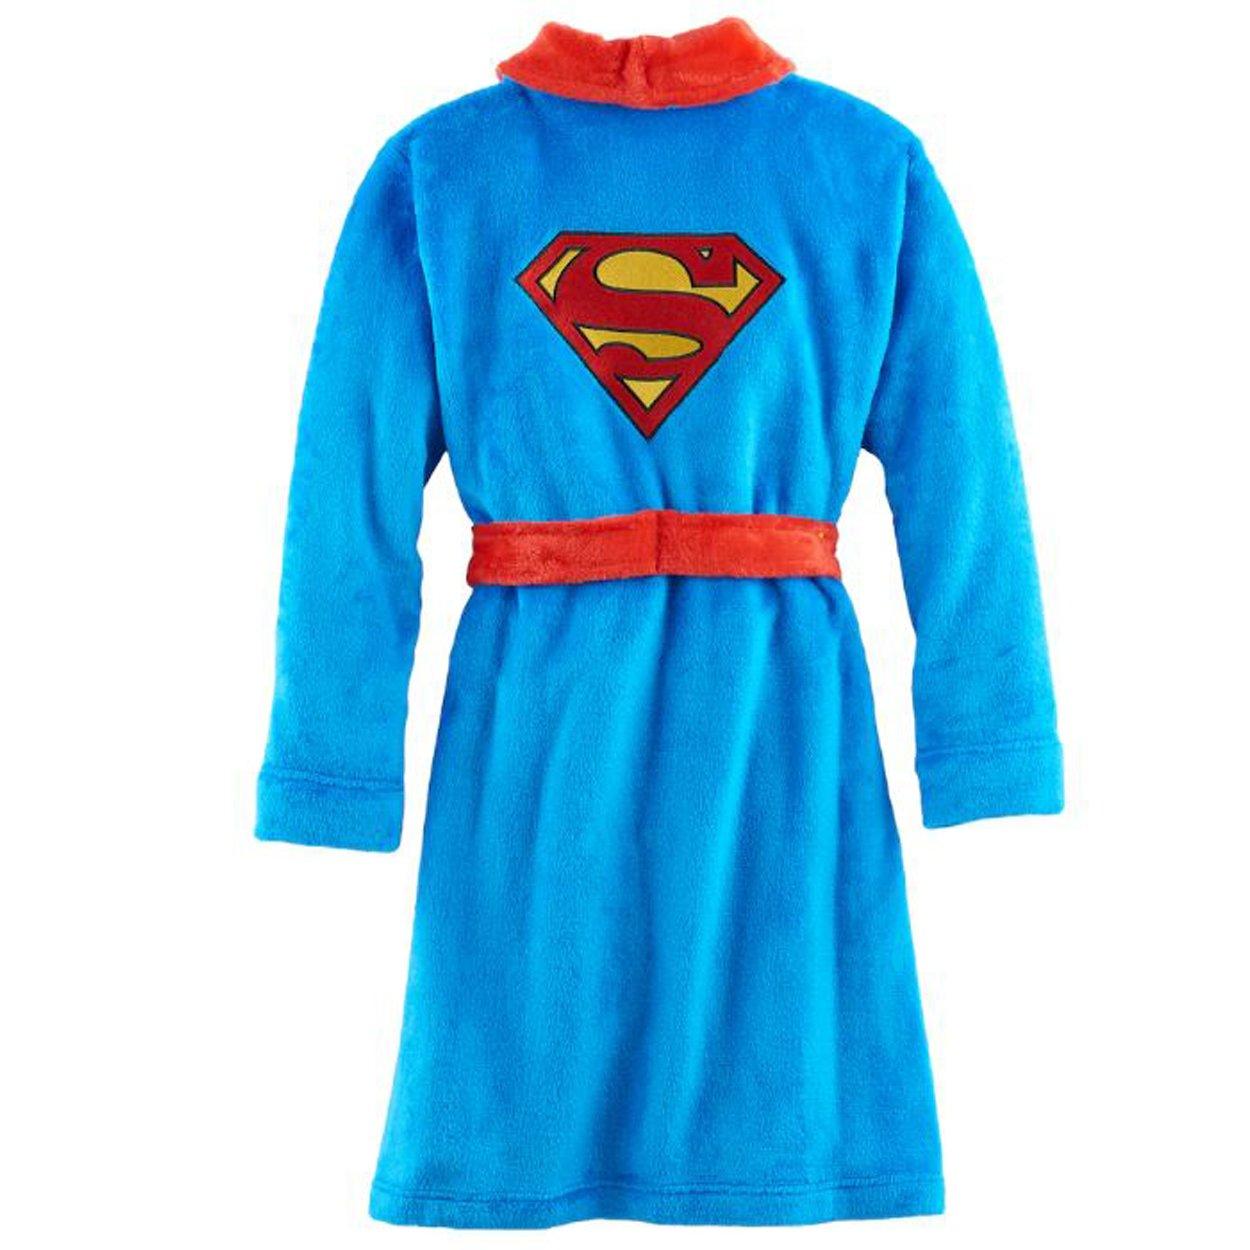 Komar Kids Superman Boys Fleece Bathrobe Robe (Medium/8, Blue) by Komar Kids (Image #2)